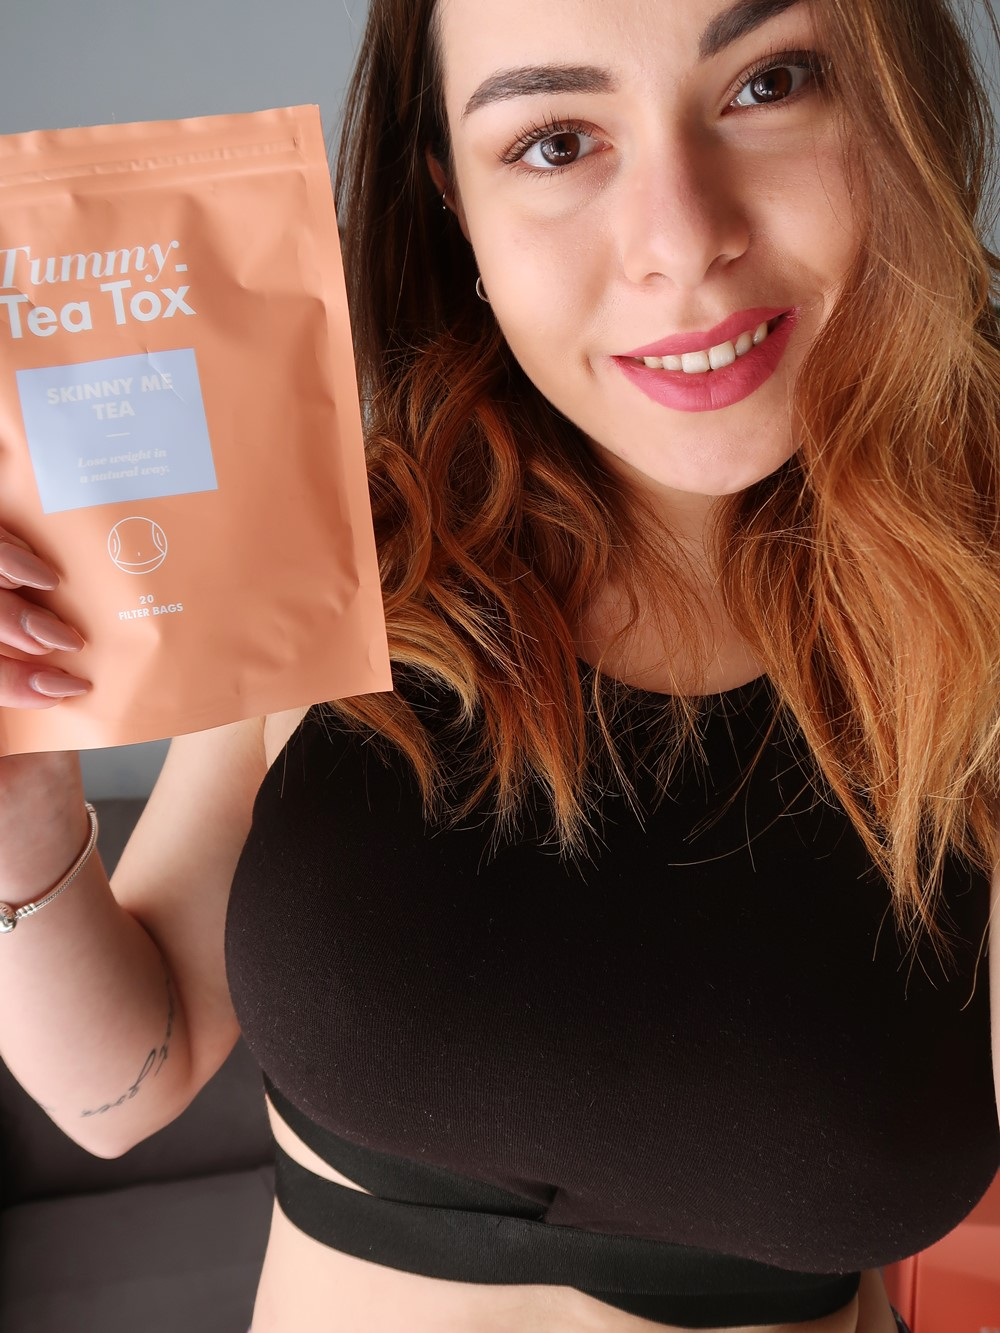 dieta zhenas slim me recensioni di tè